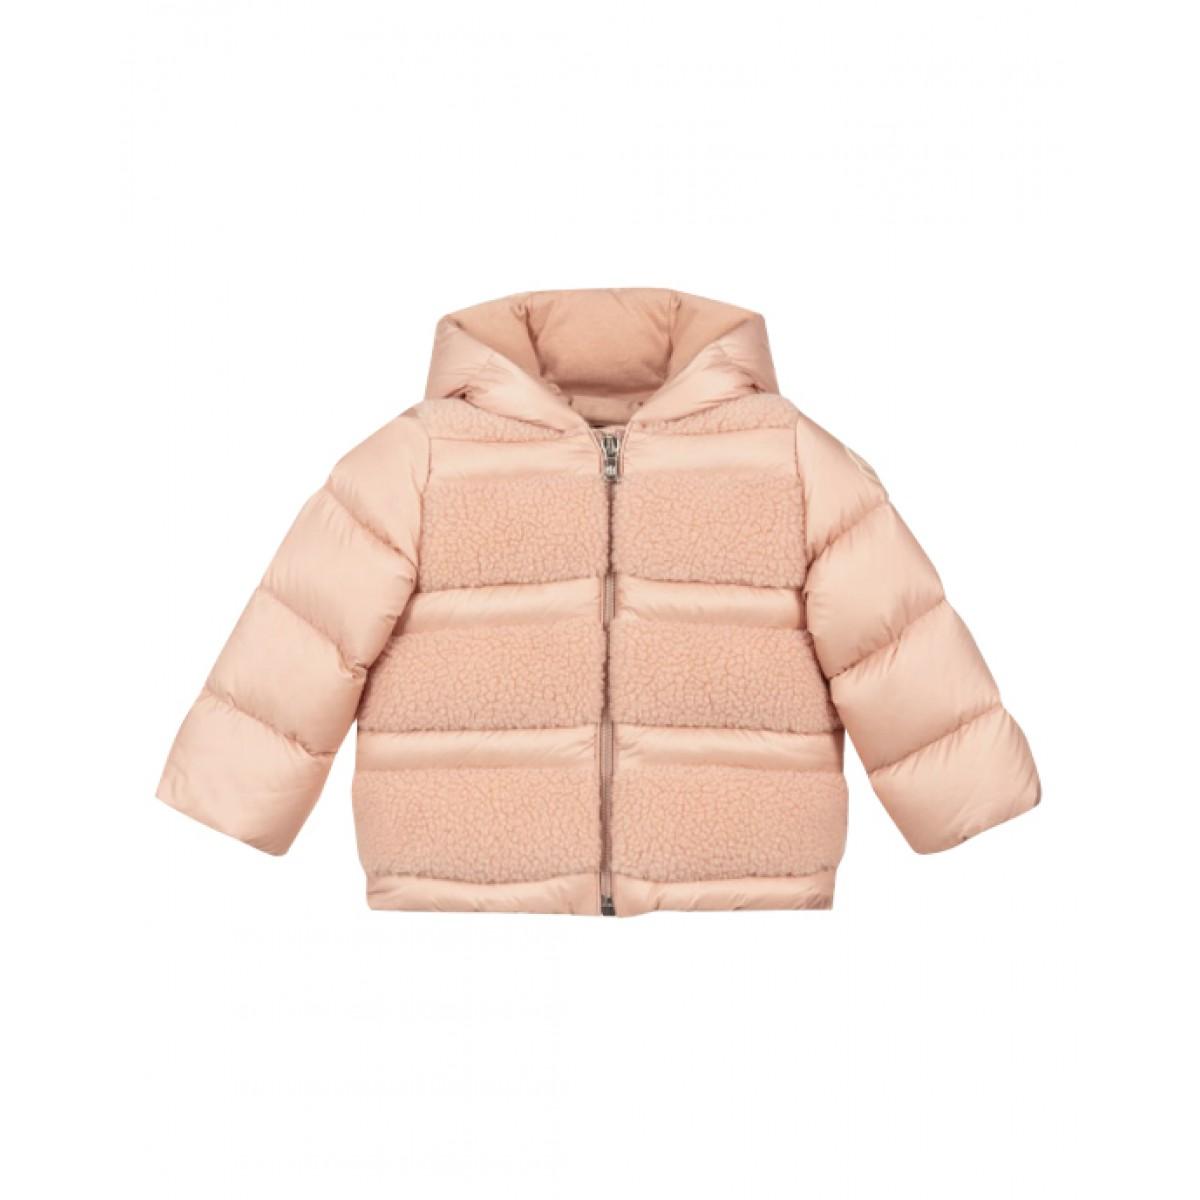 Pink down puffer jacket